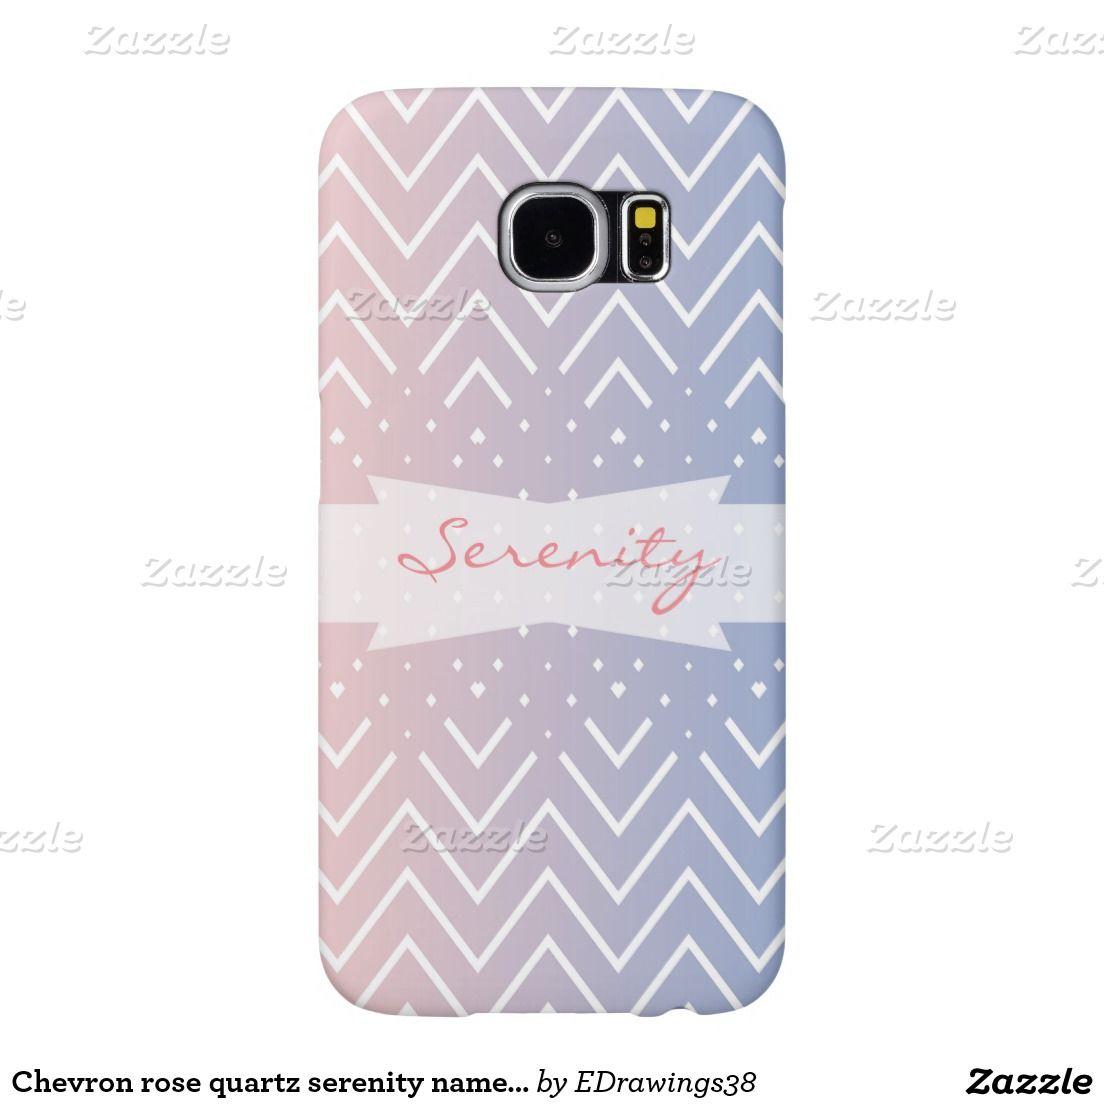 #Chevron #rosequartz #serenity #name #personalized #samsung galaxy s6 #cases